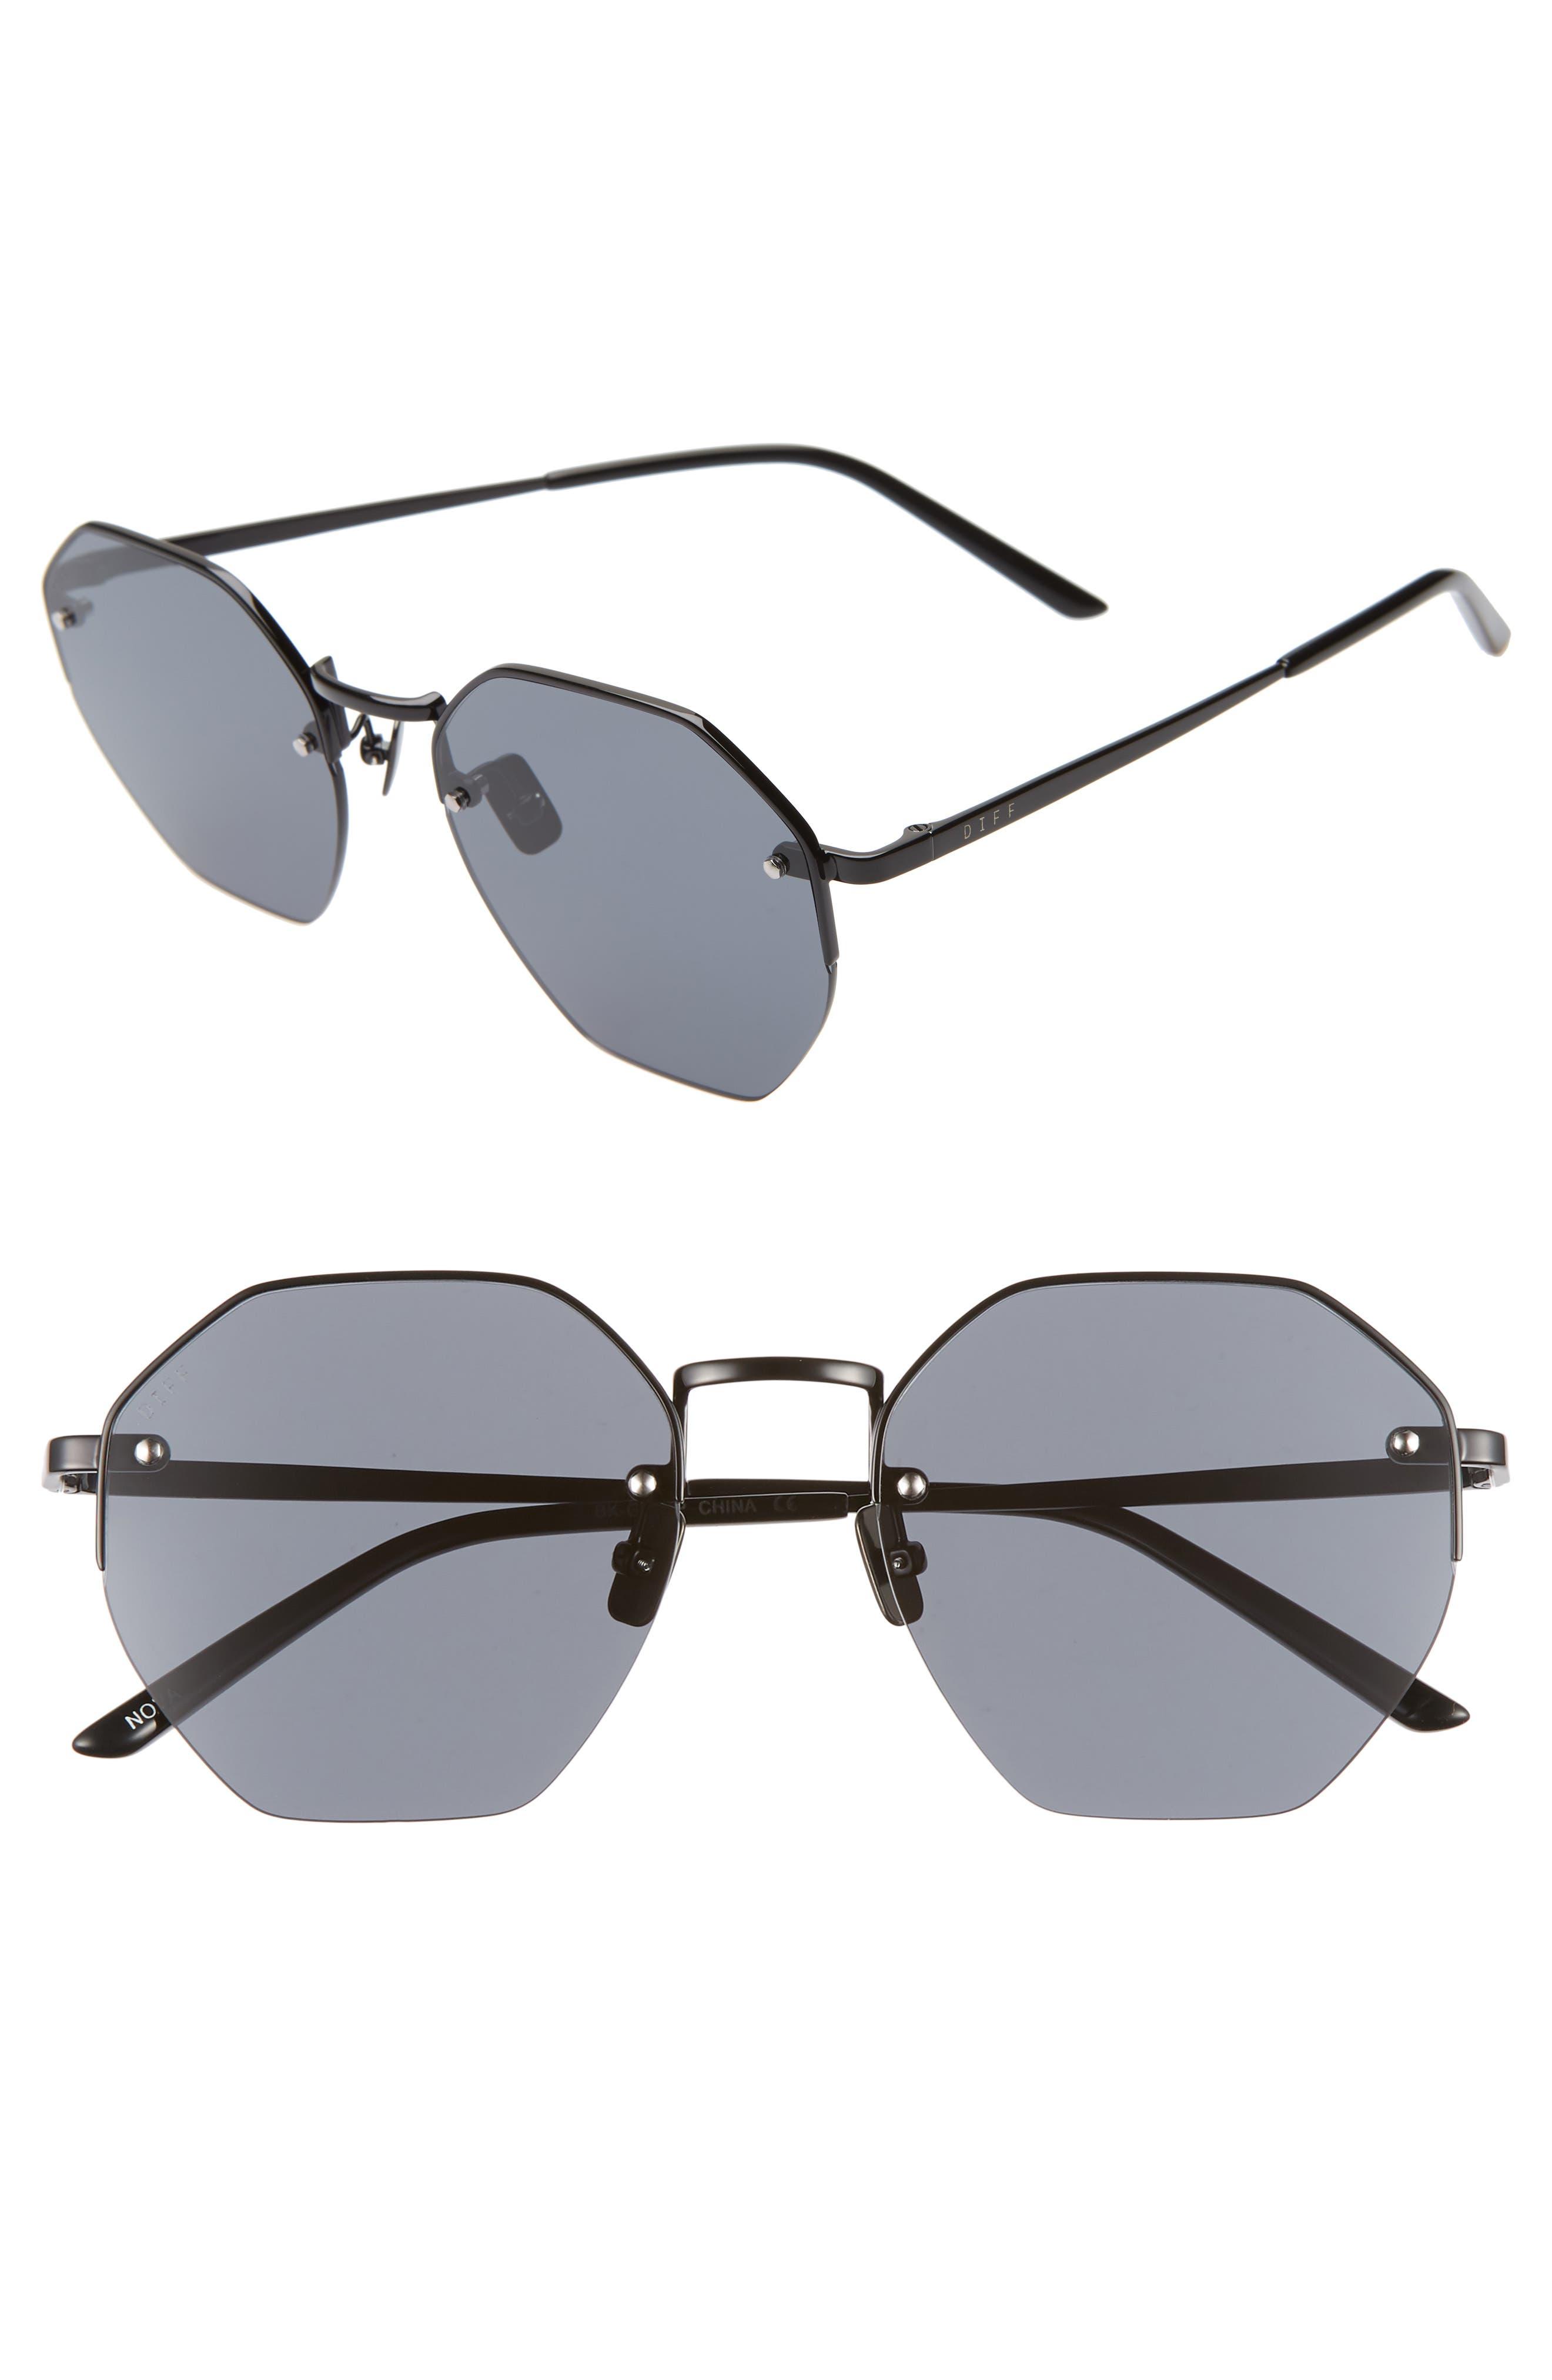 Nova 50mm Polarized Semi Rimless Geo Sunglasses,                         Main,                         color, BLACK/ SMOKE